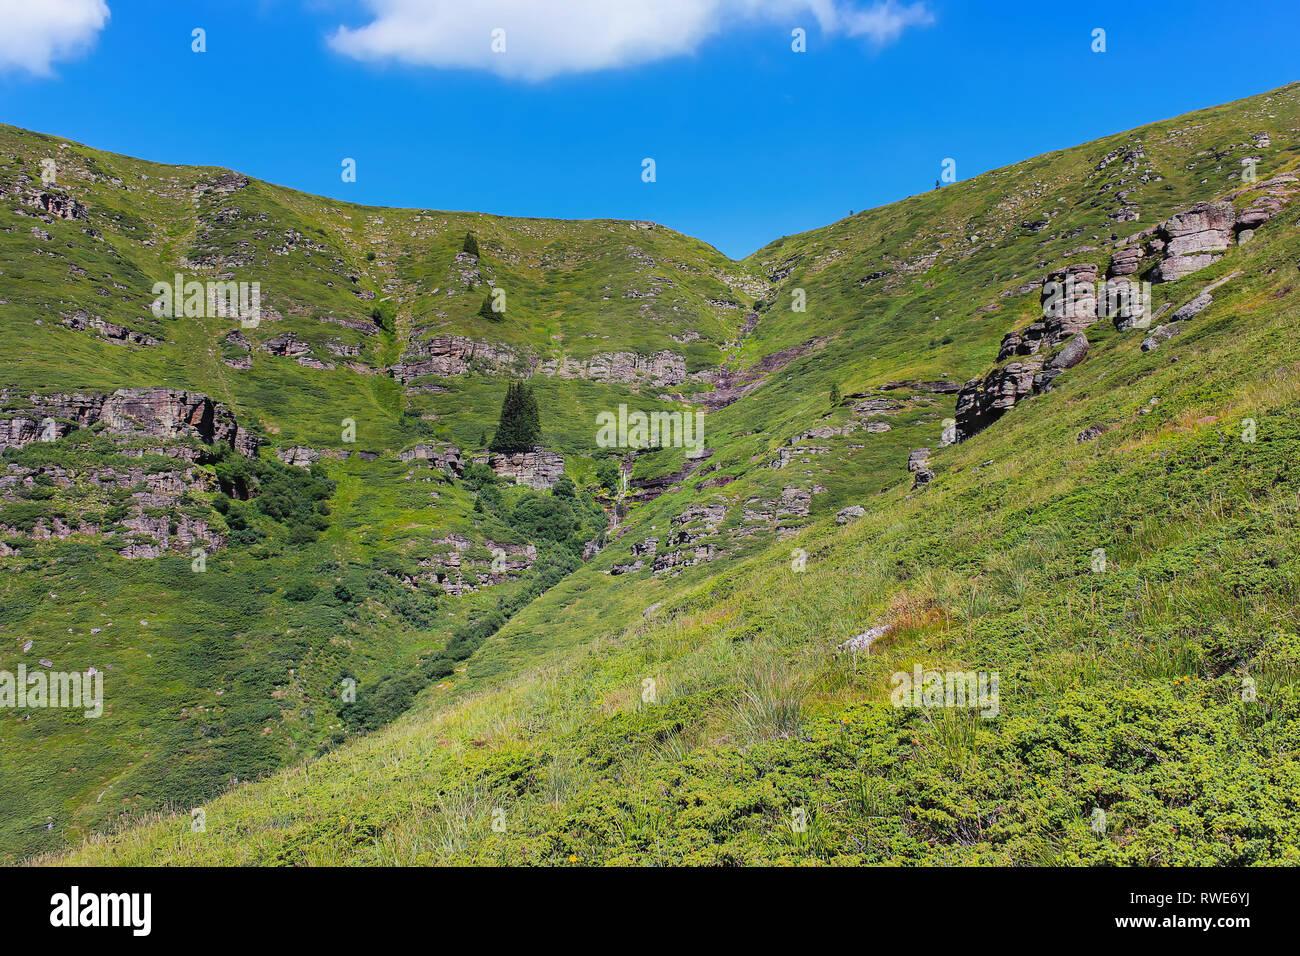 Alien, rocky, sunlit landscape and almost dried up Kopren waterfall on Old (Balkan) mountain in Serbia - Stock Image